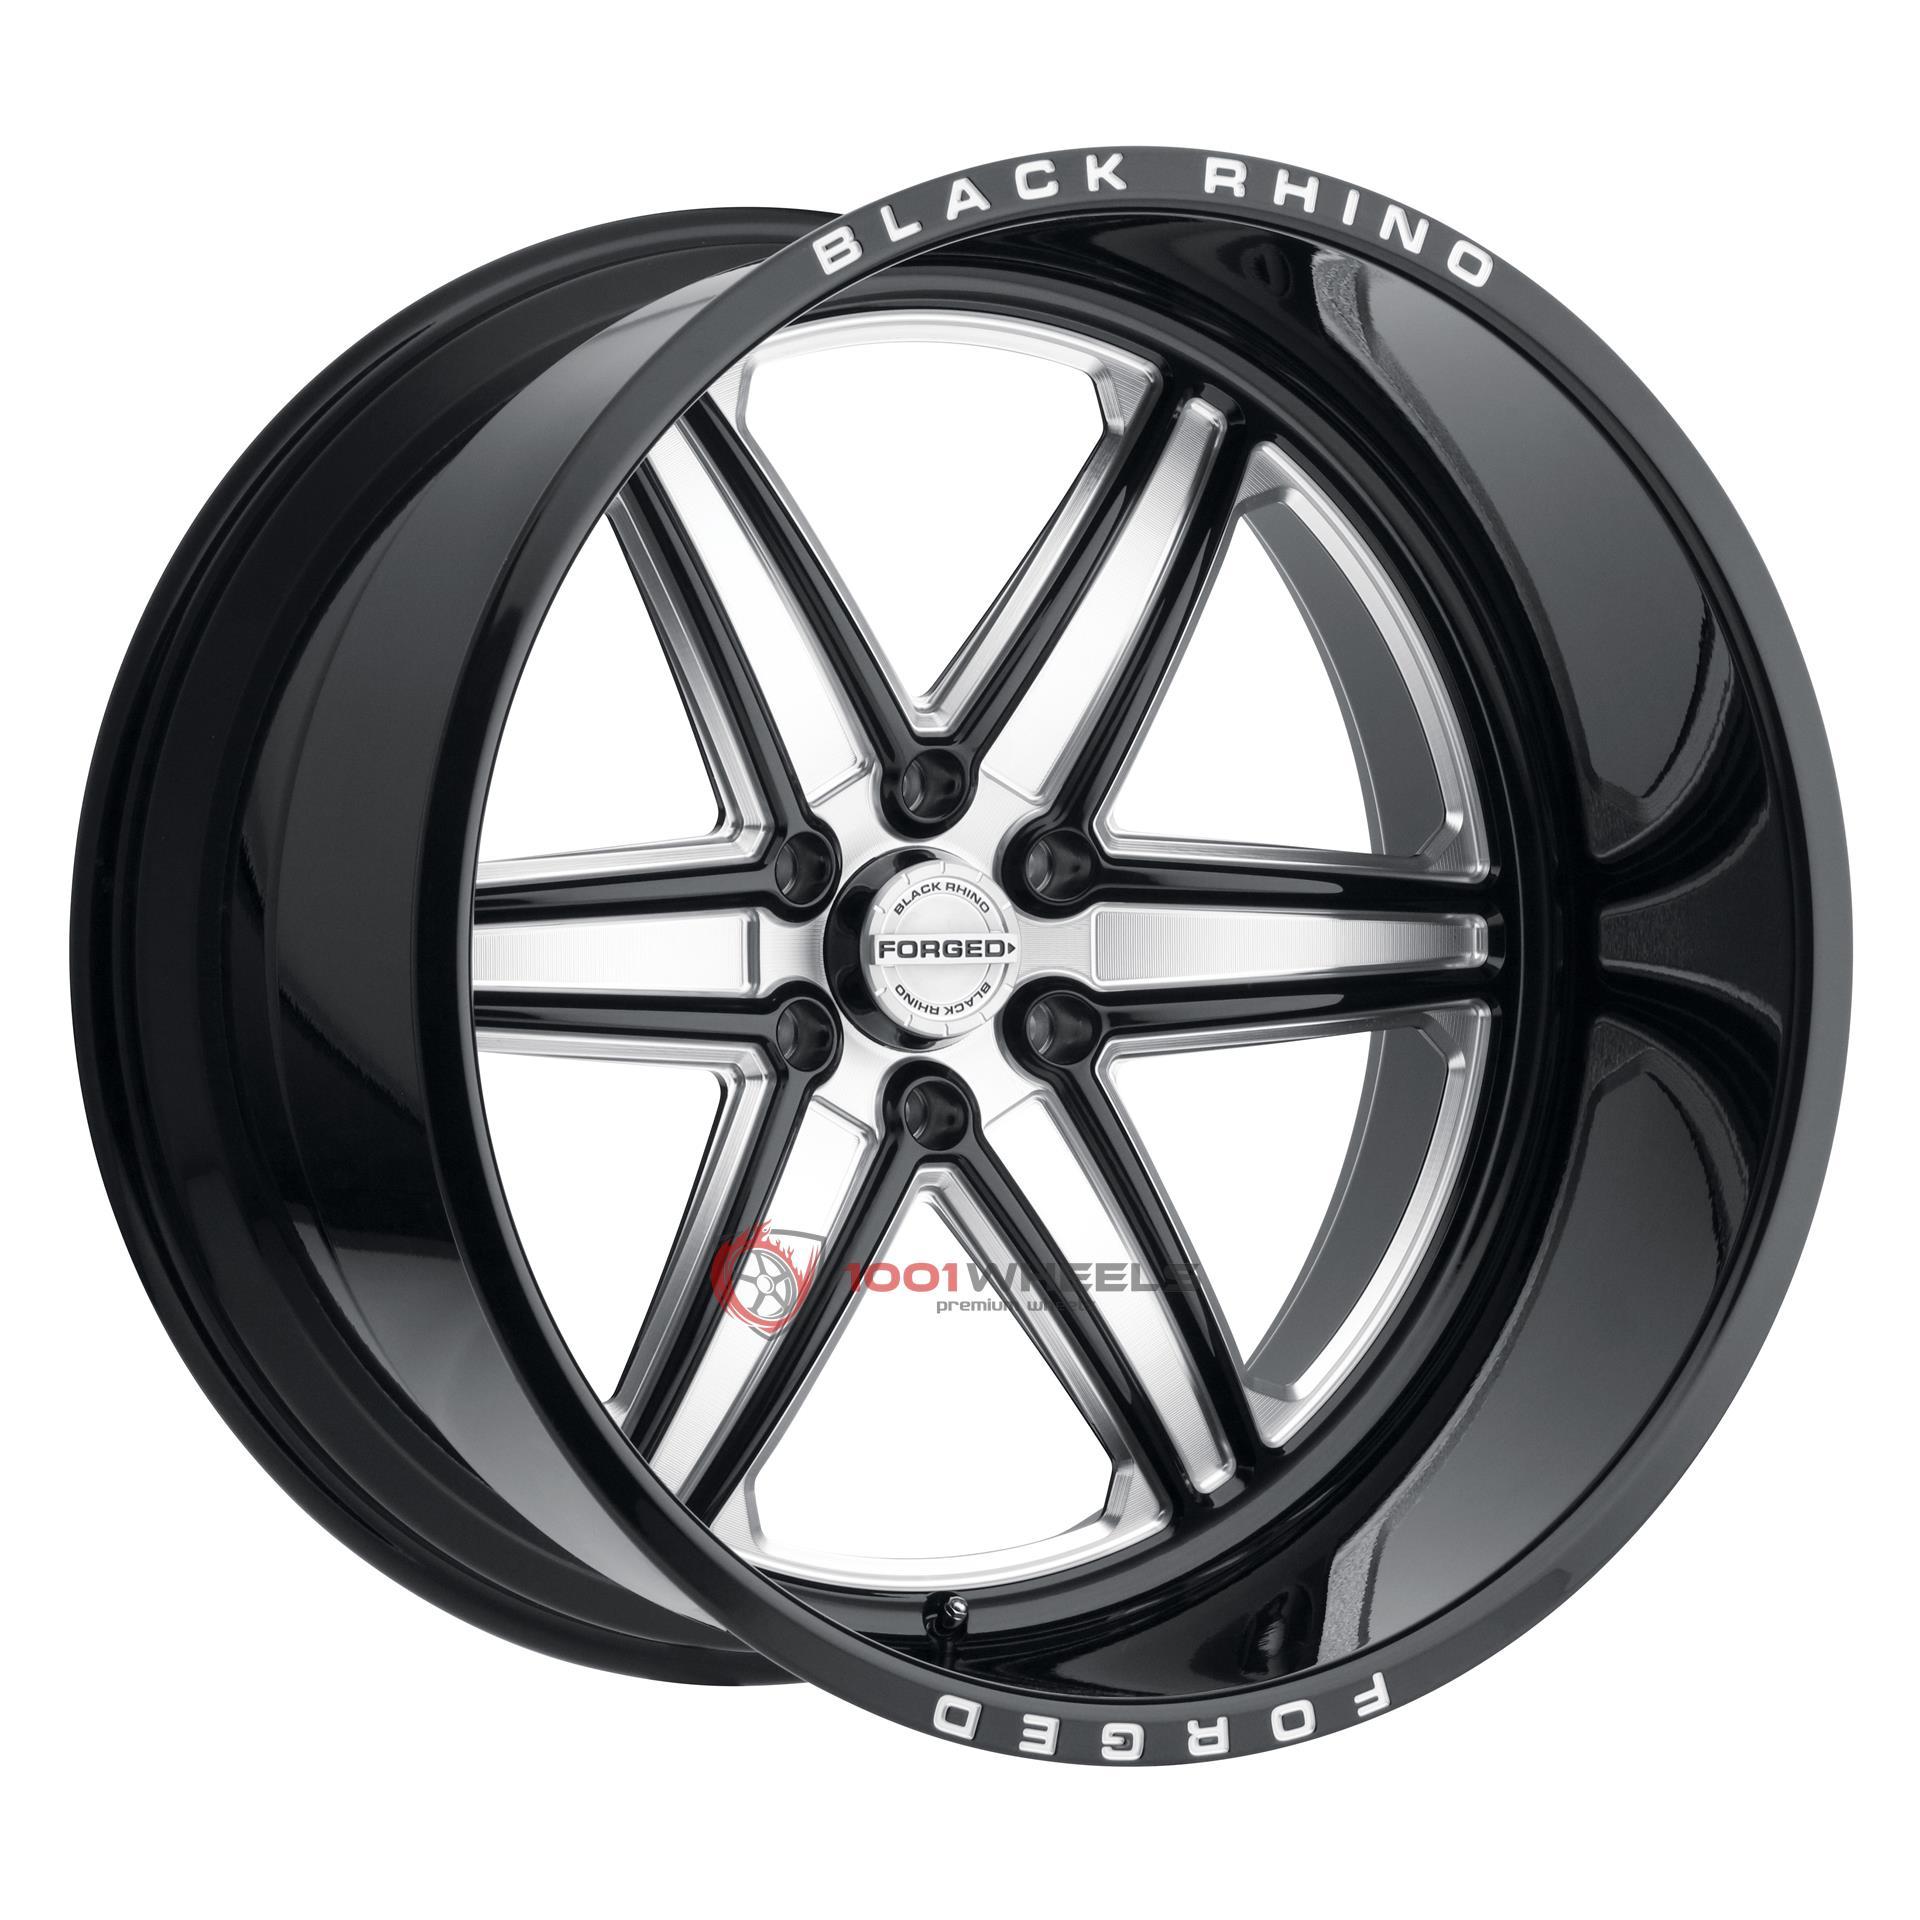 BLACK RHINO MARAUDER gloss-black-wmilled-spokes